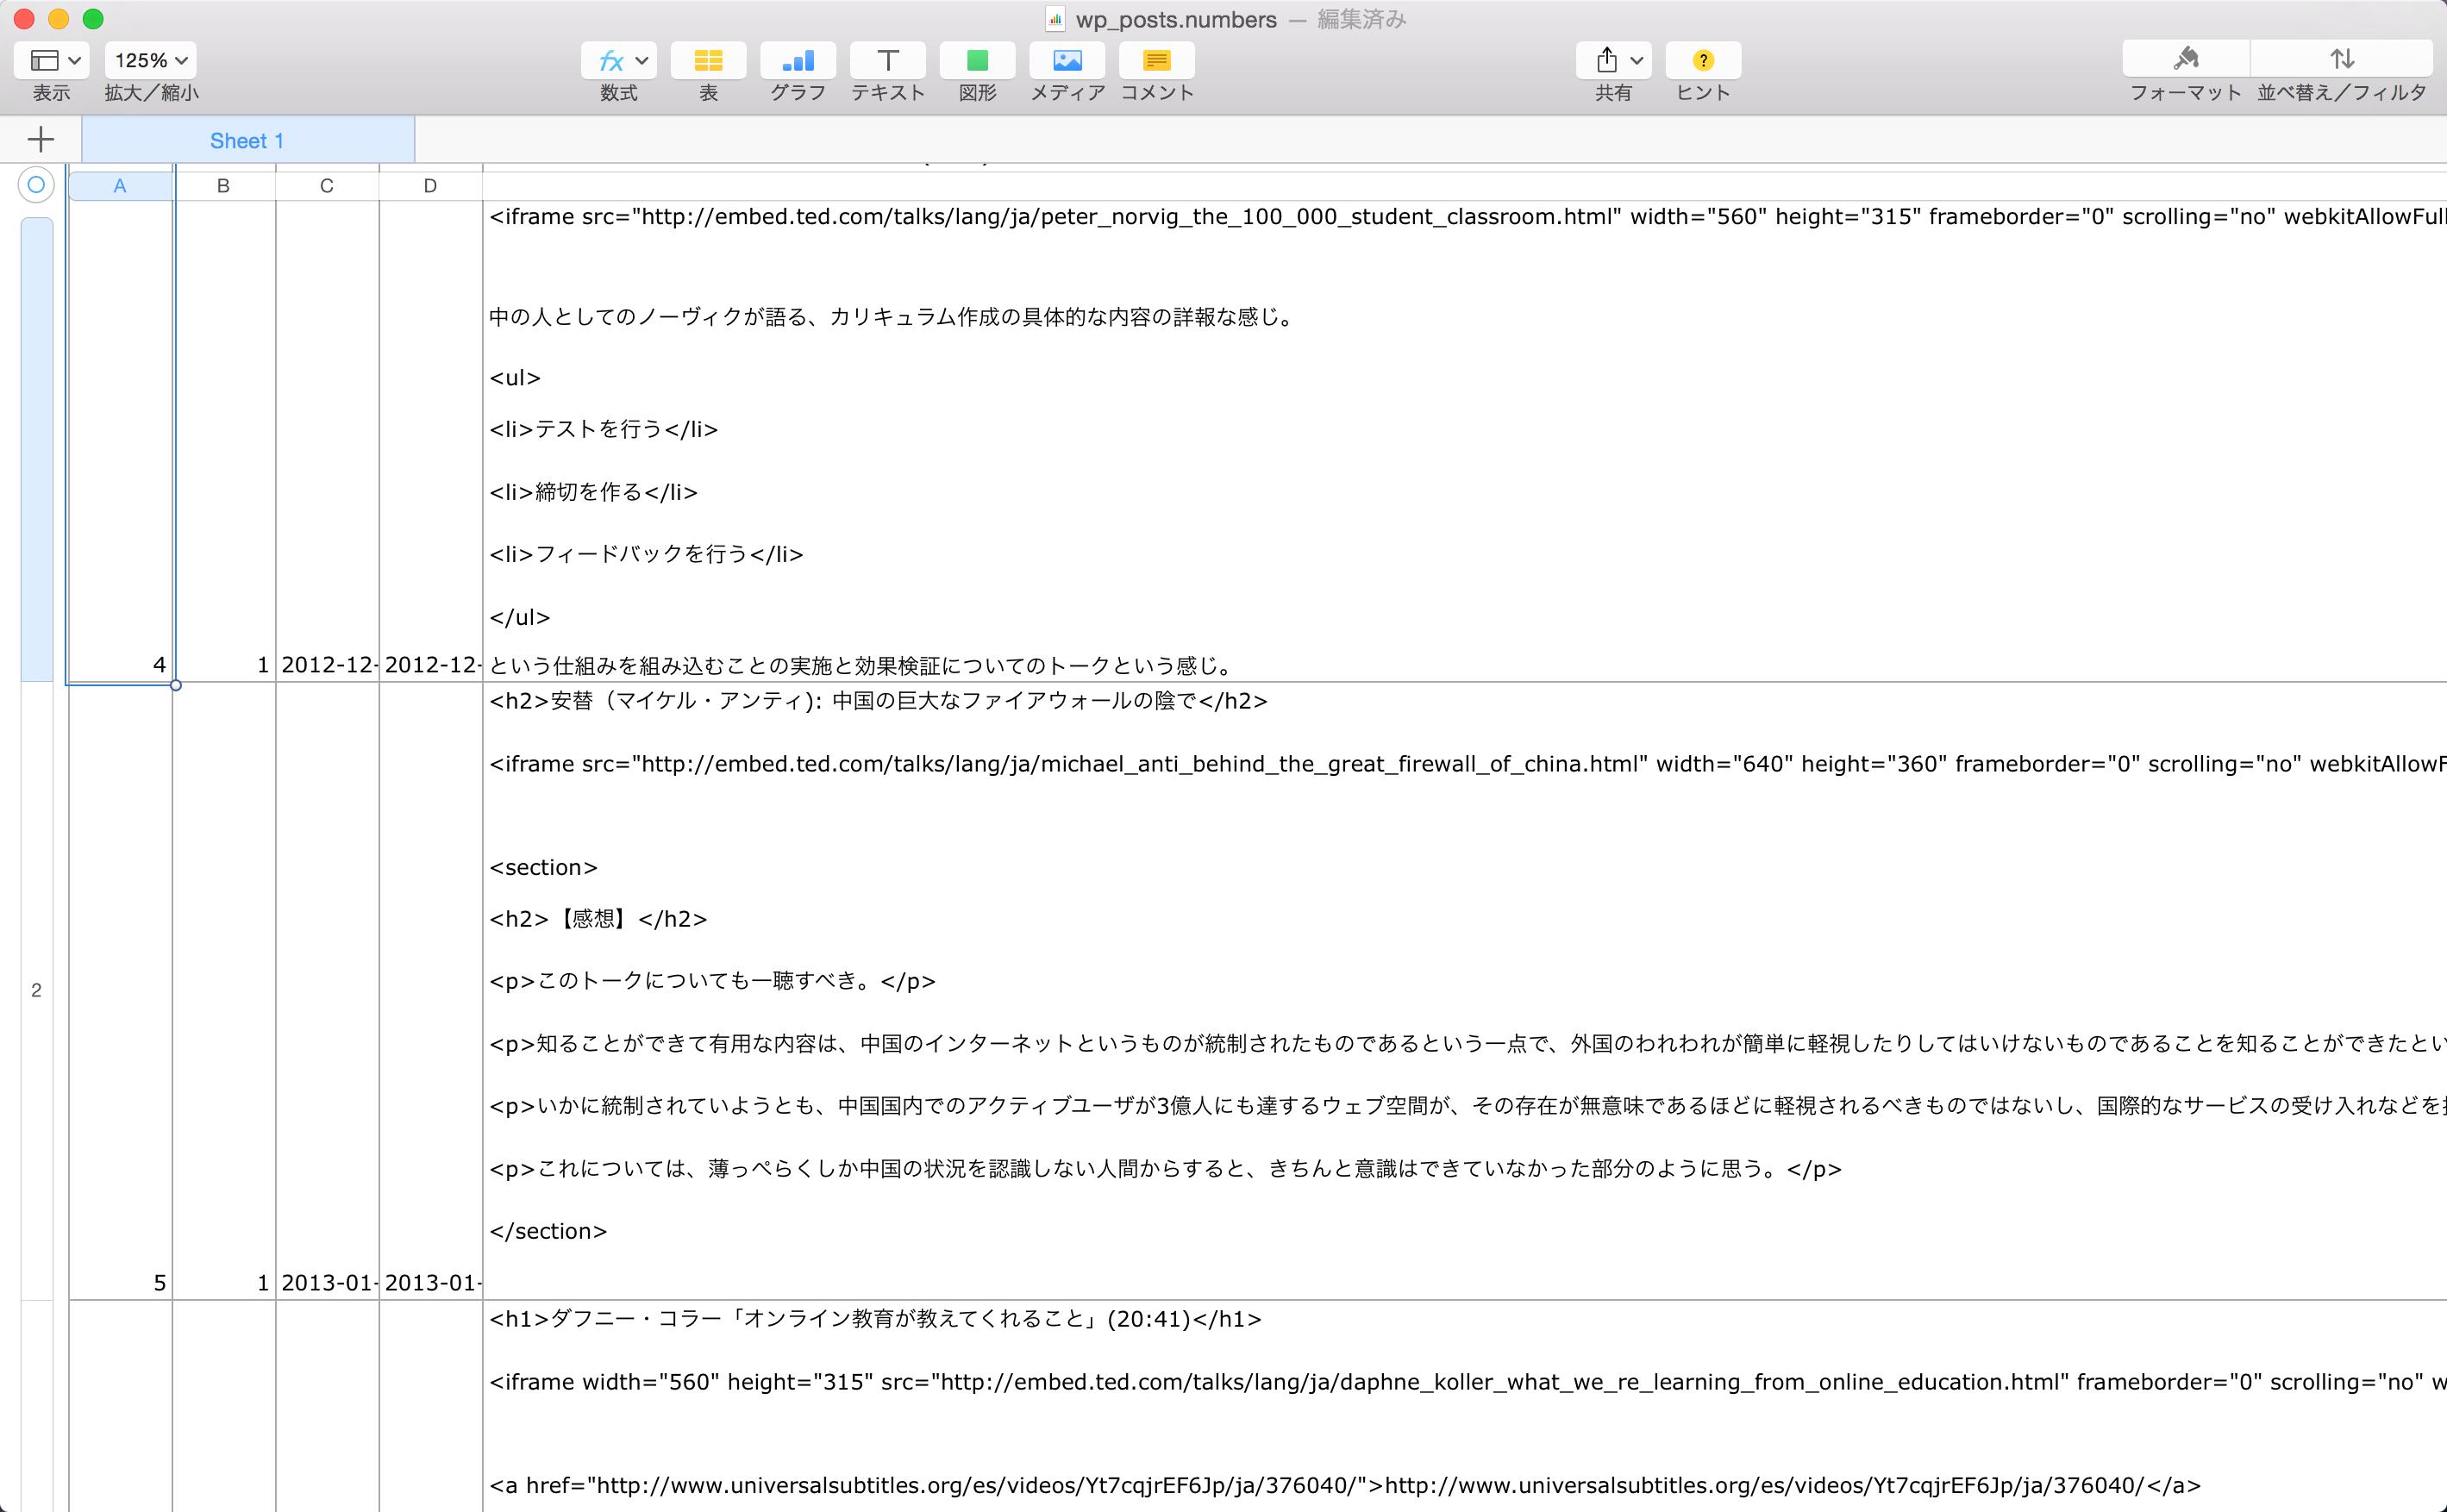 PHPMyAdmin_Export_10.png